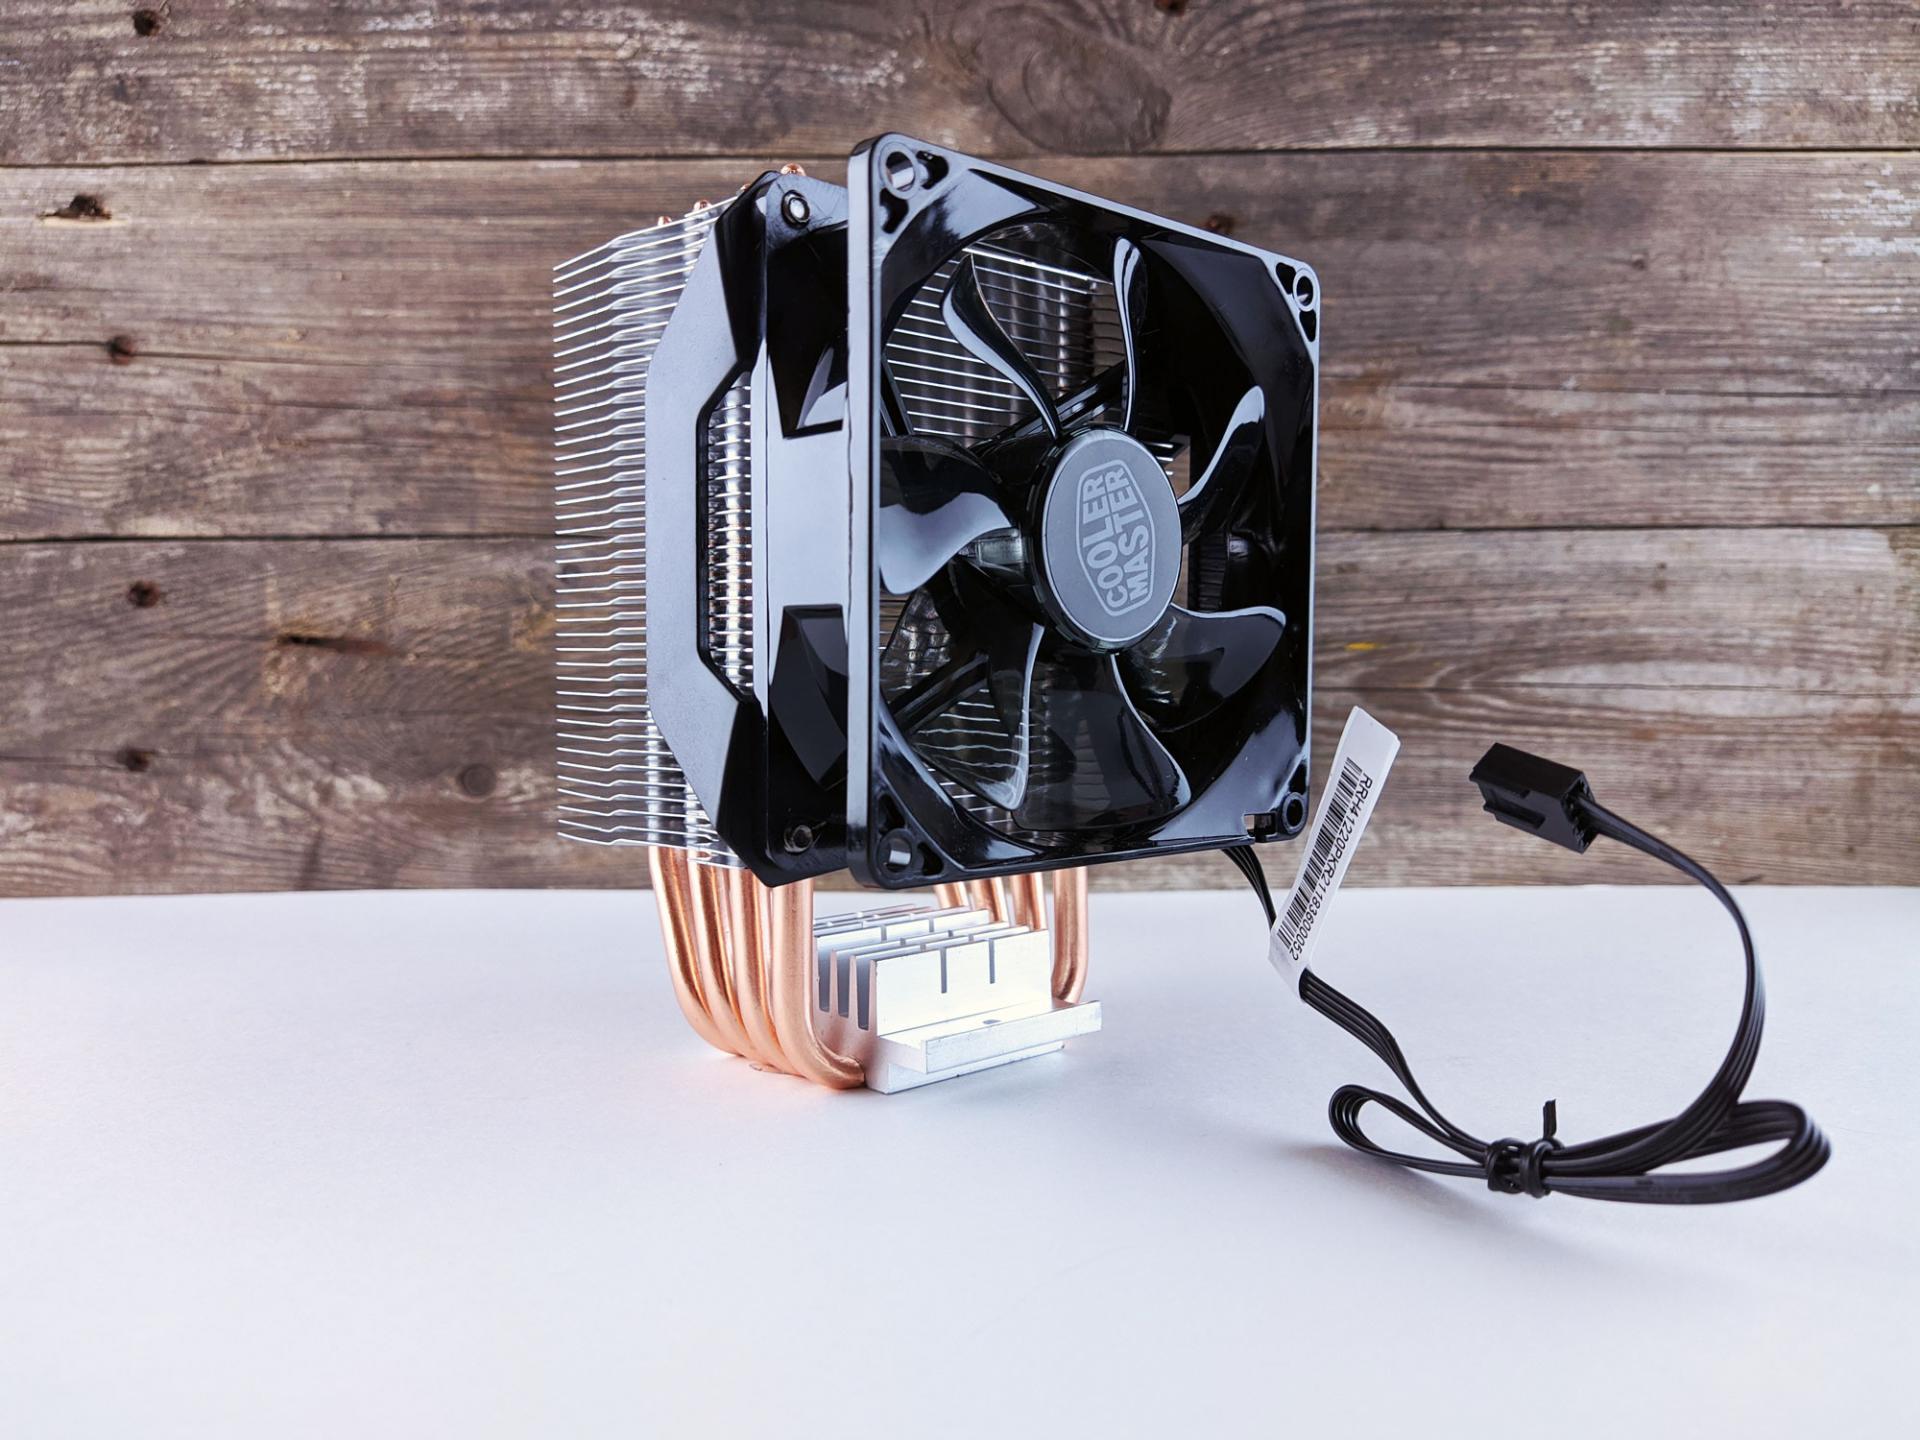 Тест-драйв процессорного кулера Cooler Master Hyper H412R наAMD Ryzen 3 3100